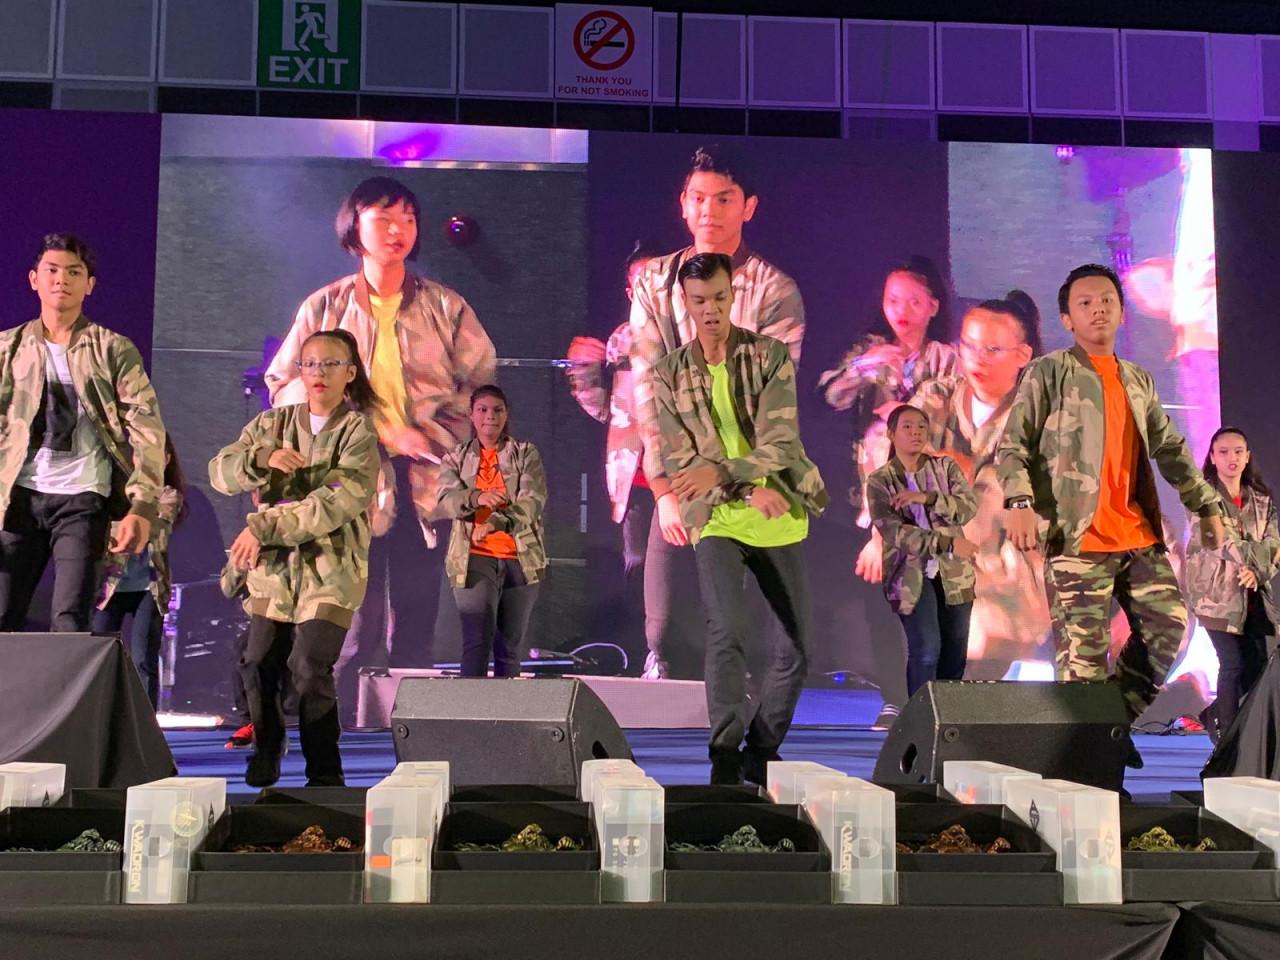 apsn singapore kids performance